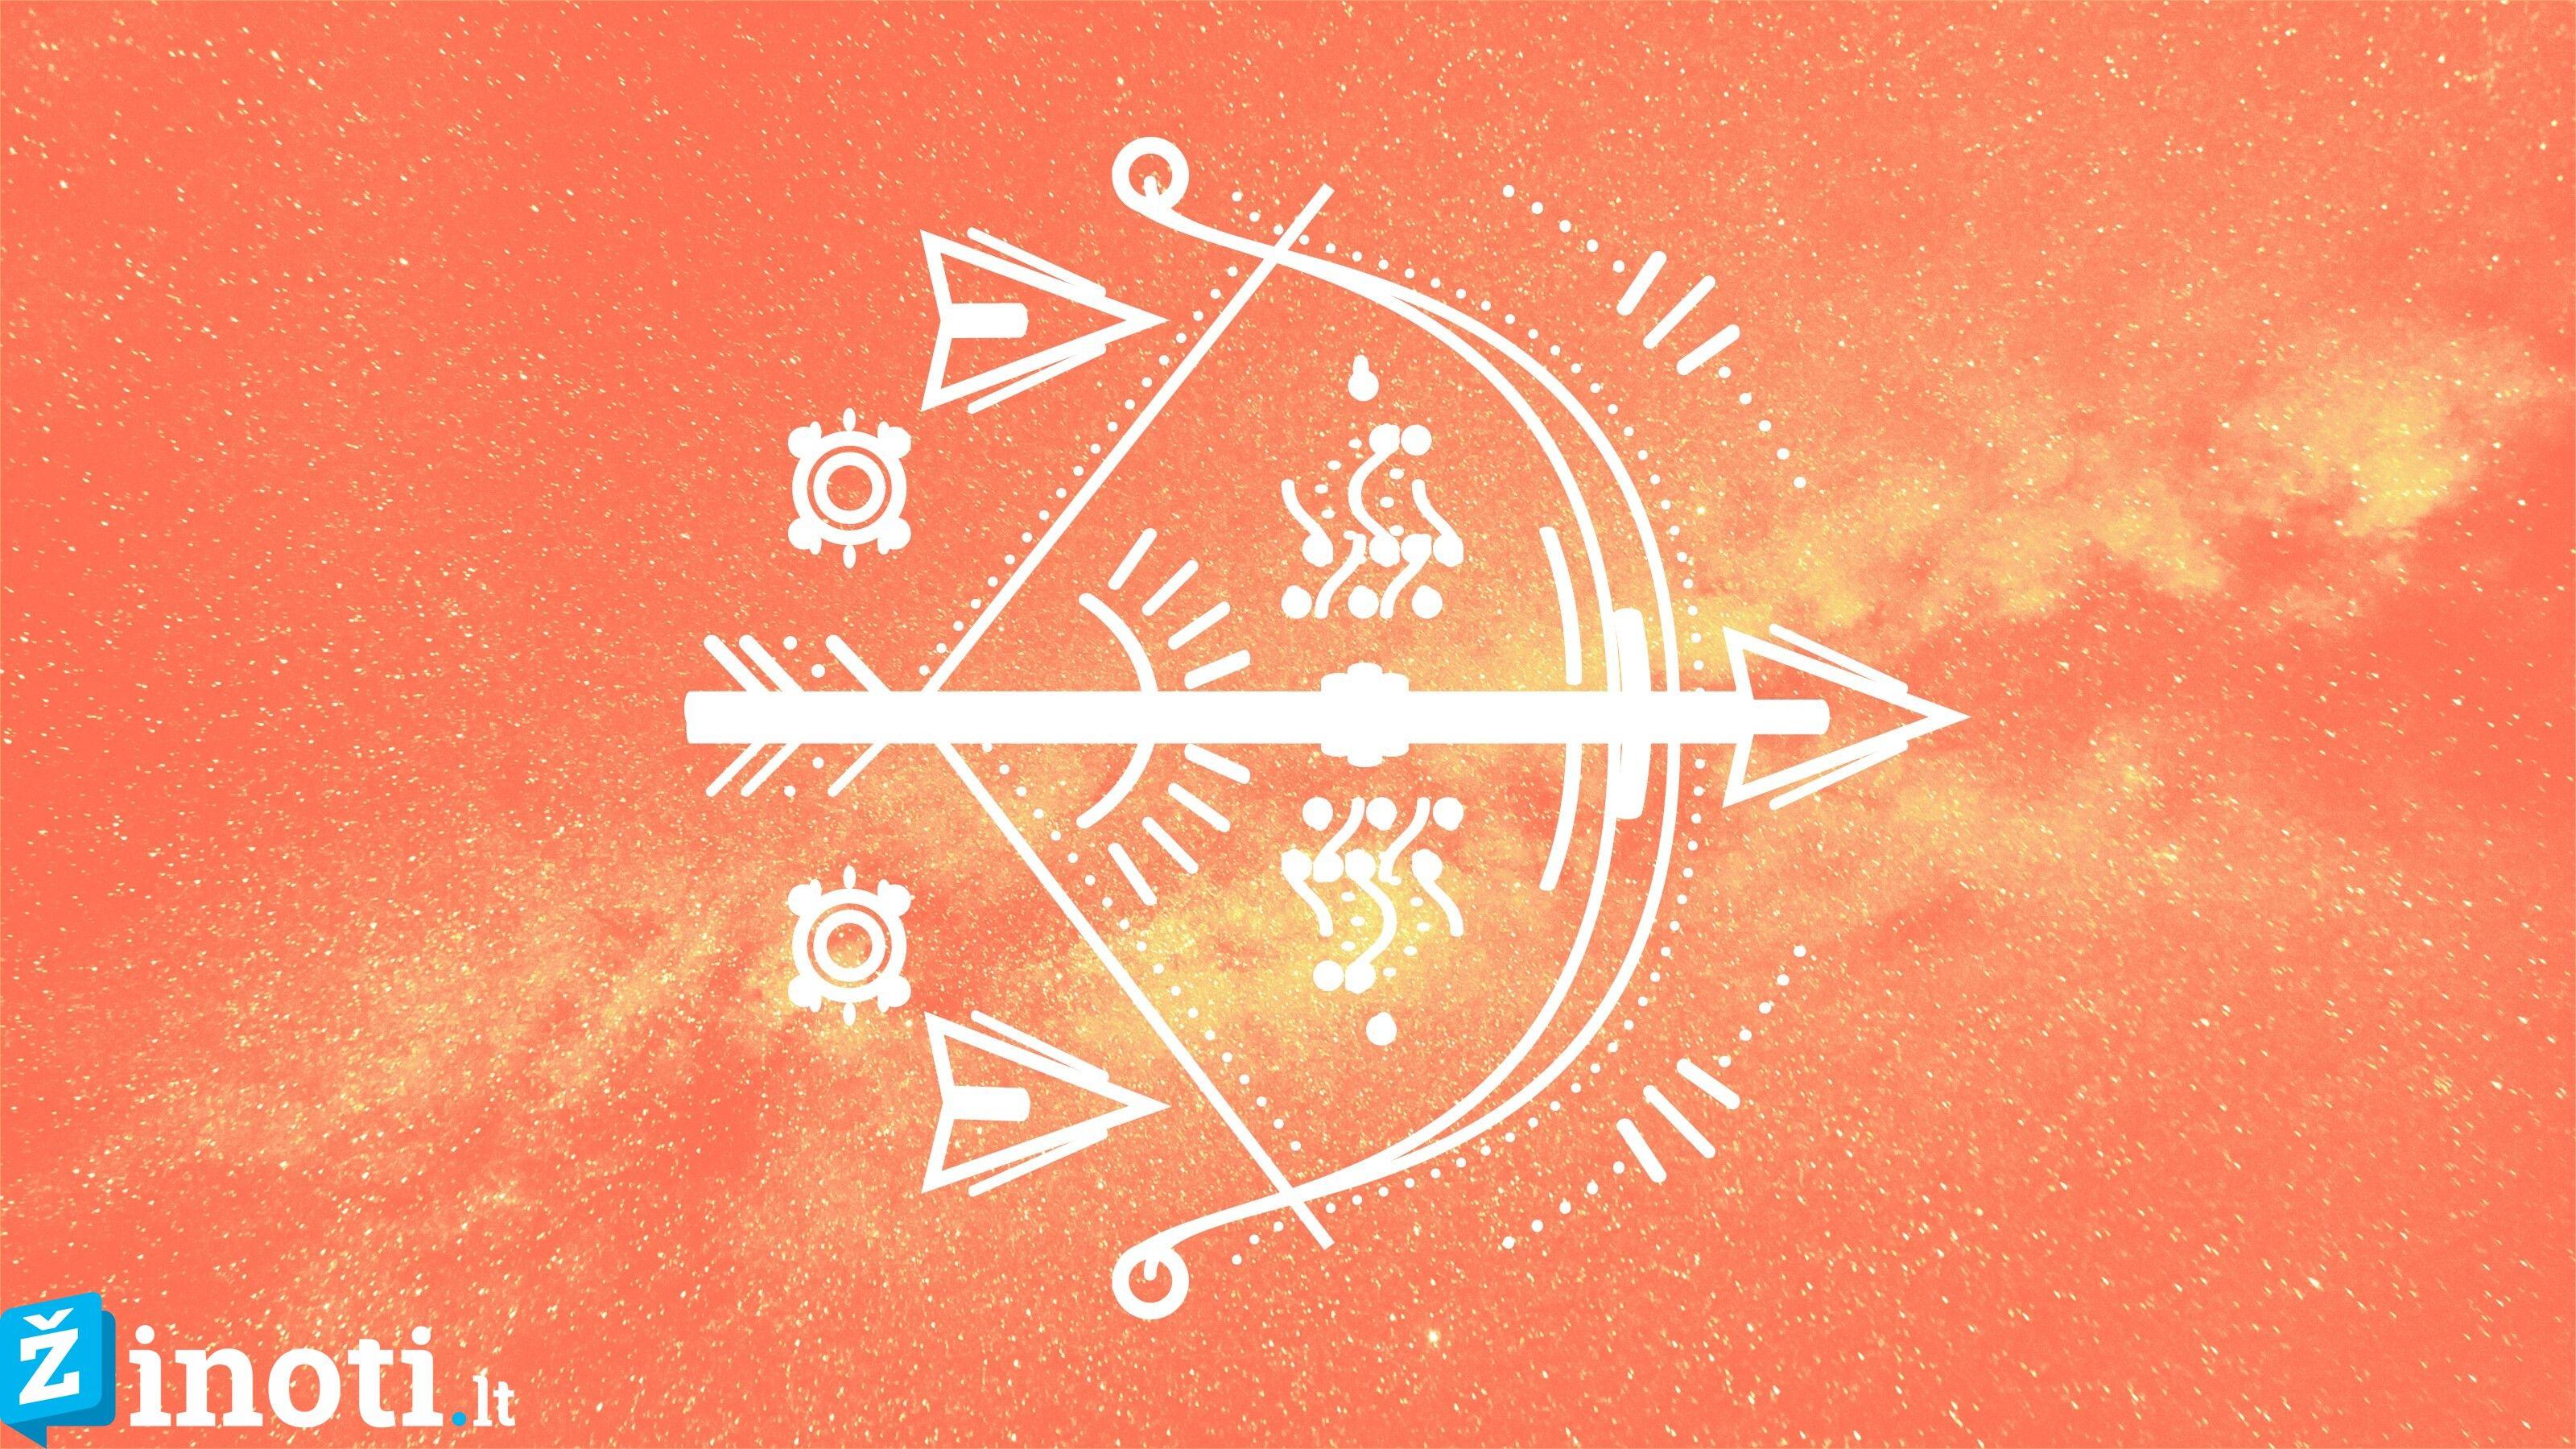 šaulys, savaitės horoskopas